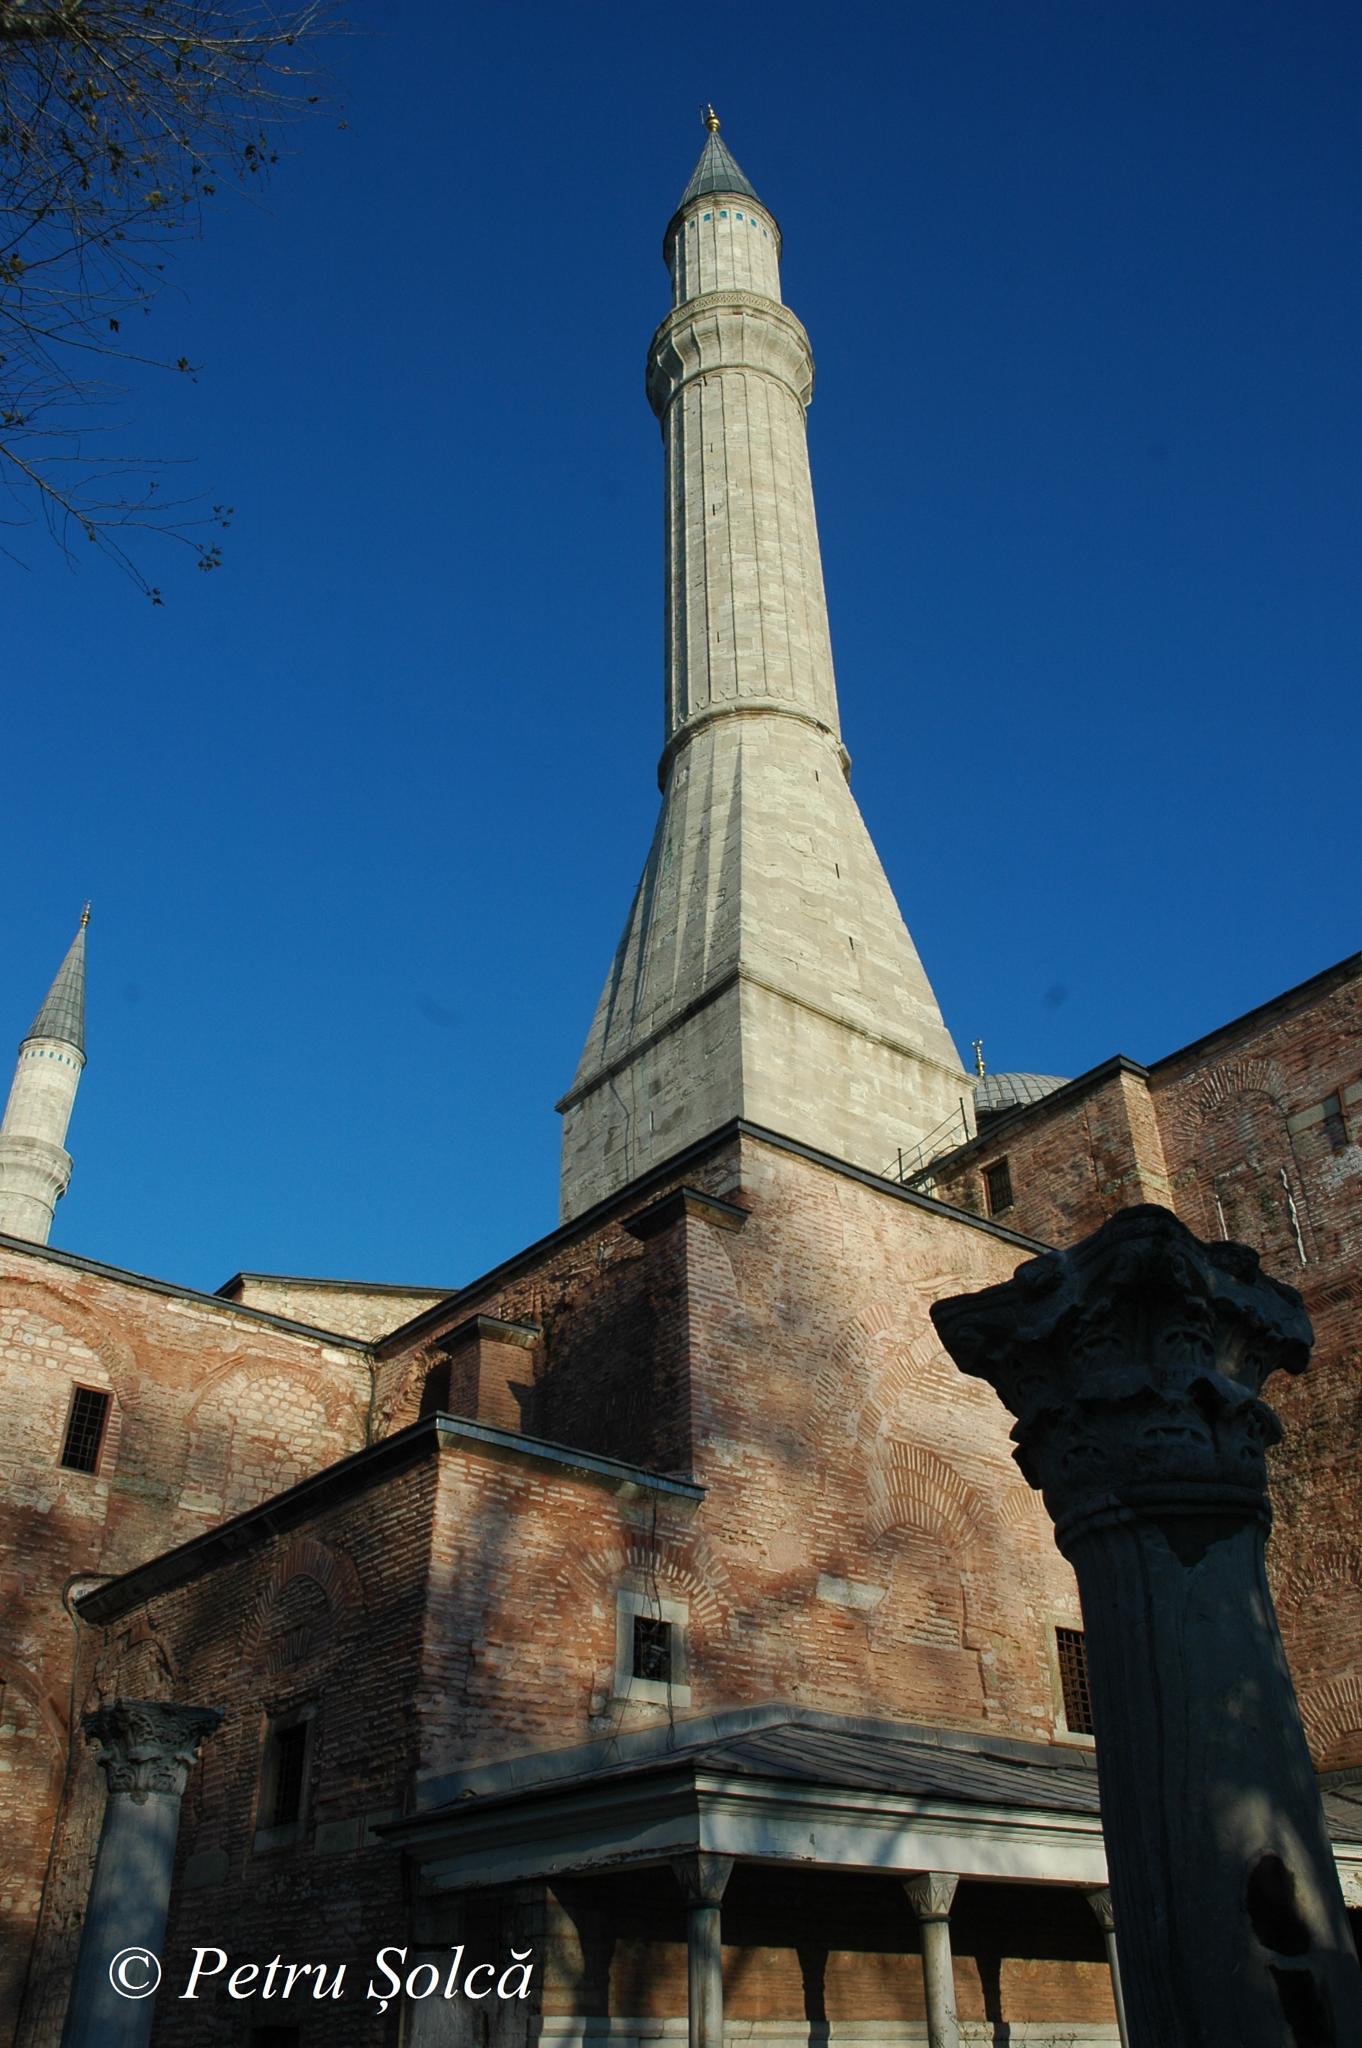 Istanbul, Turkey by Petru Solca